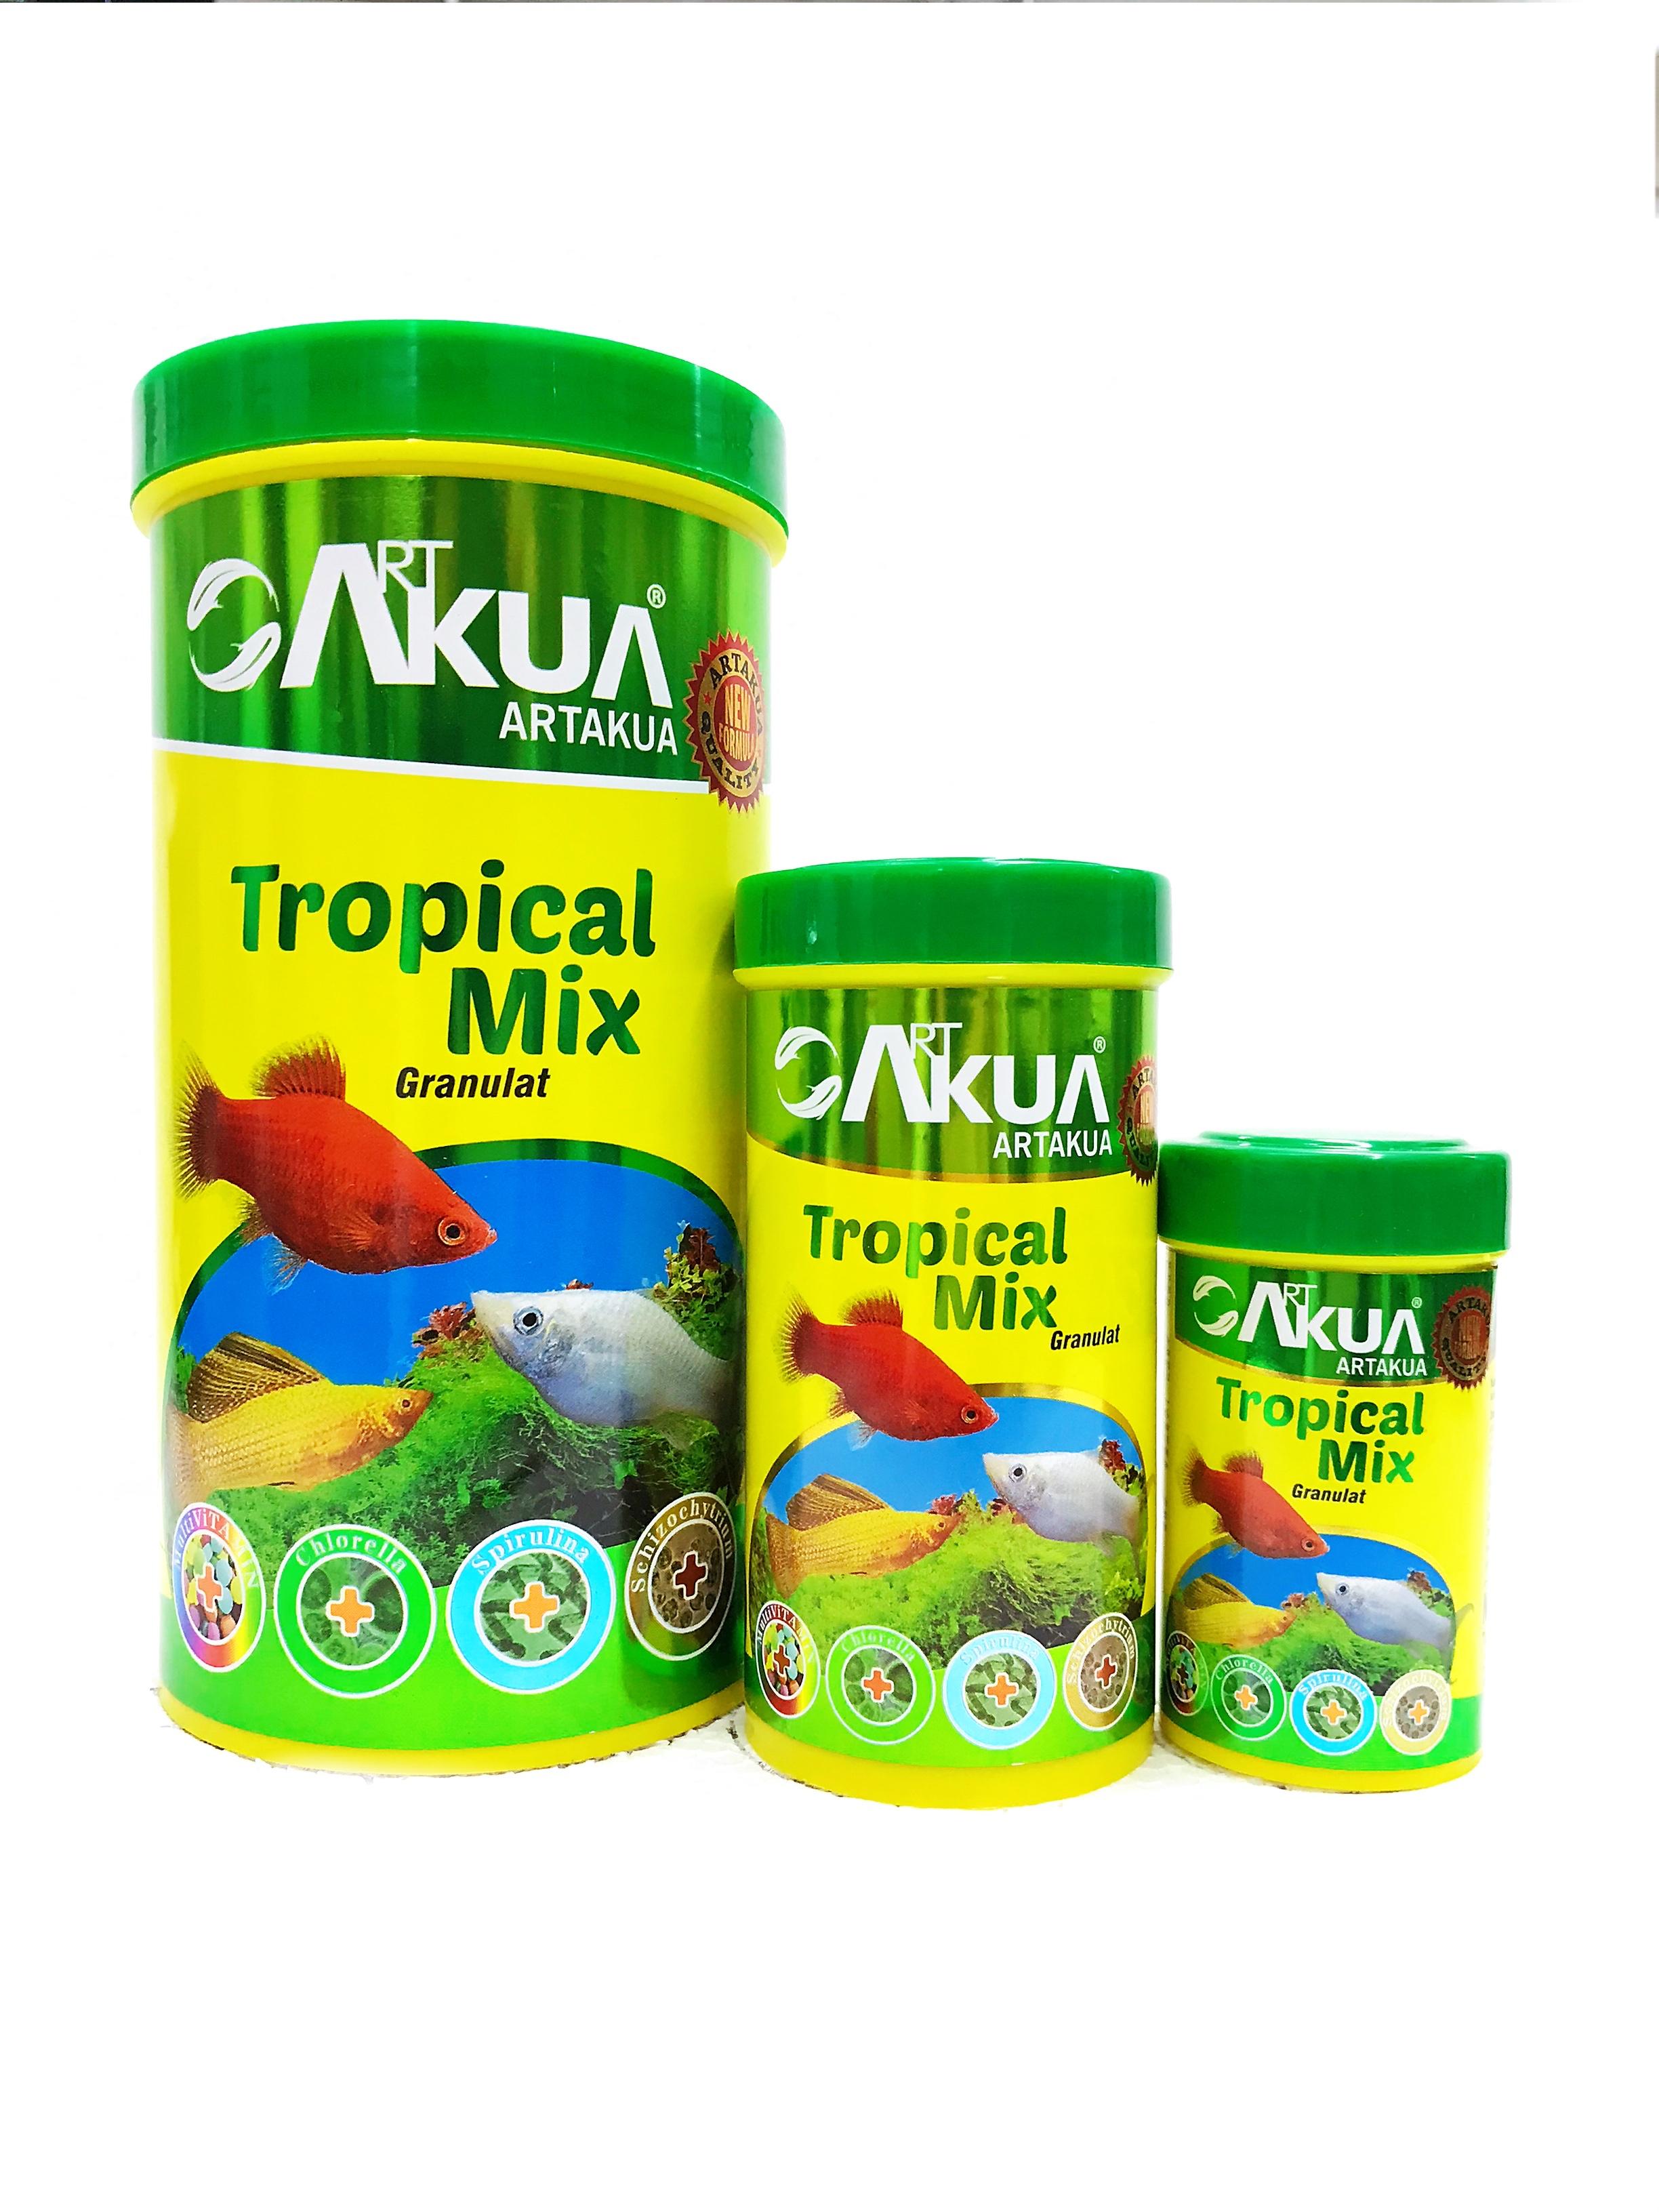 Artakua Tropical Mix